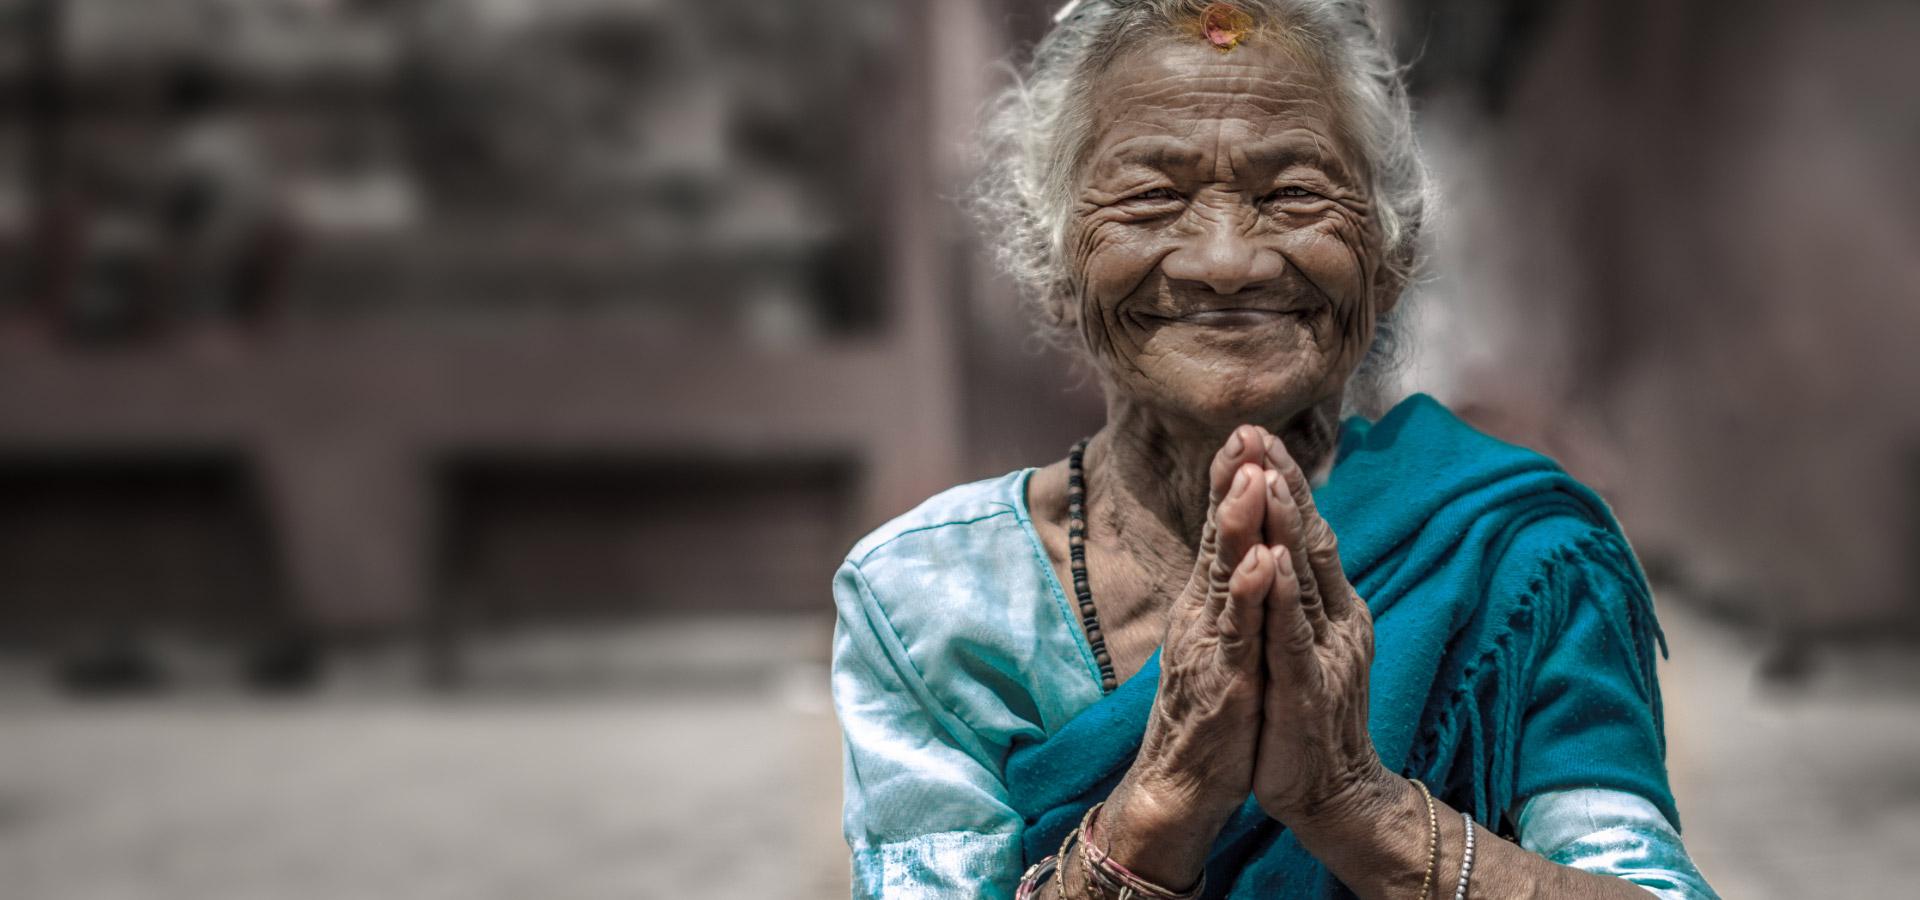 Local nepal lady